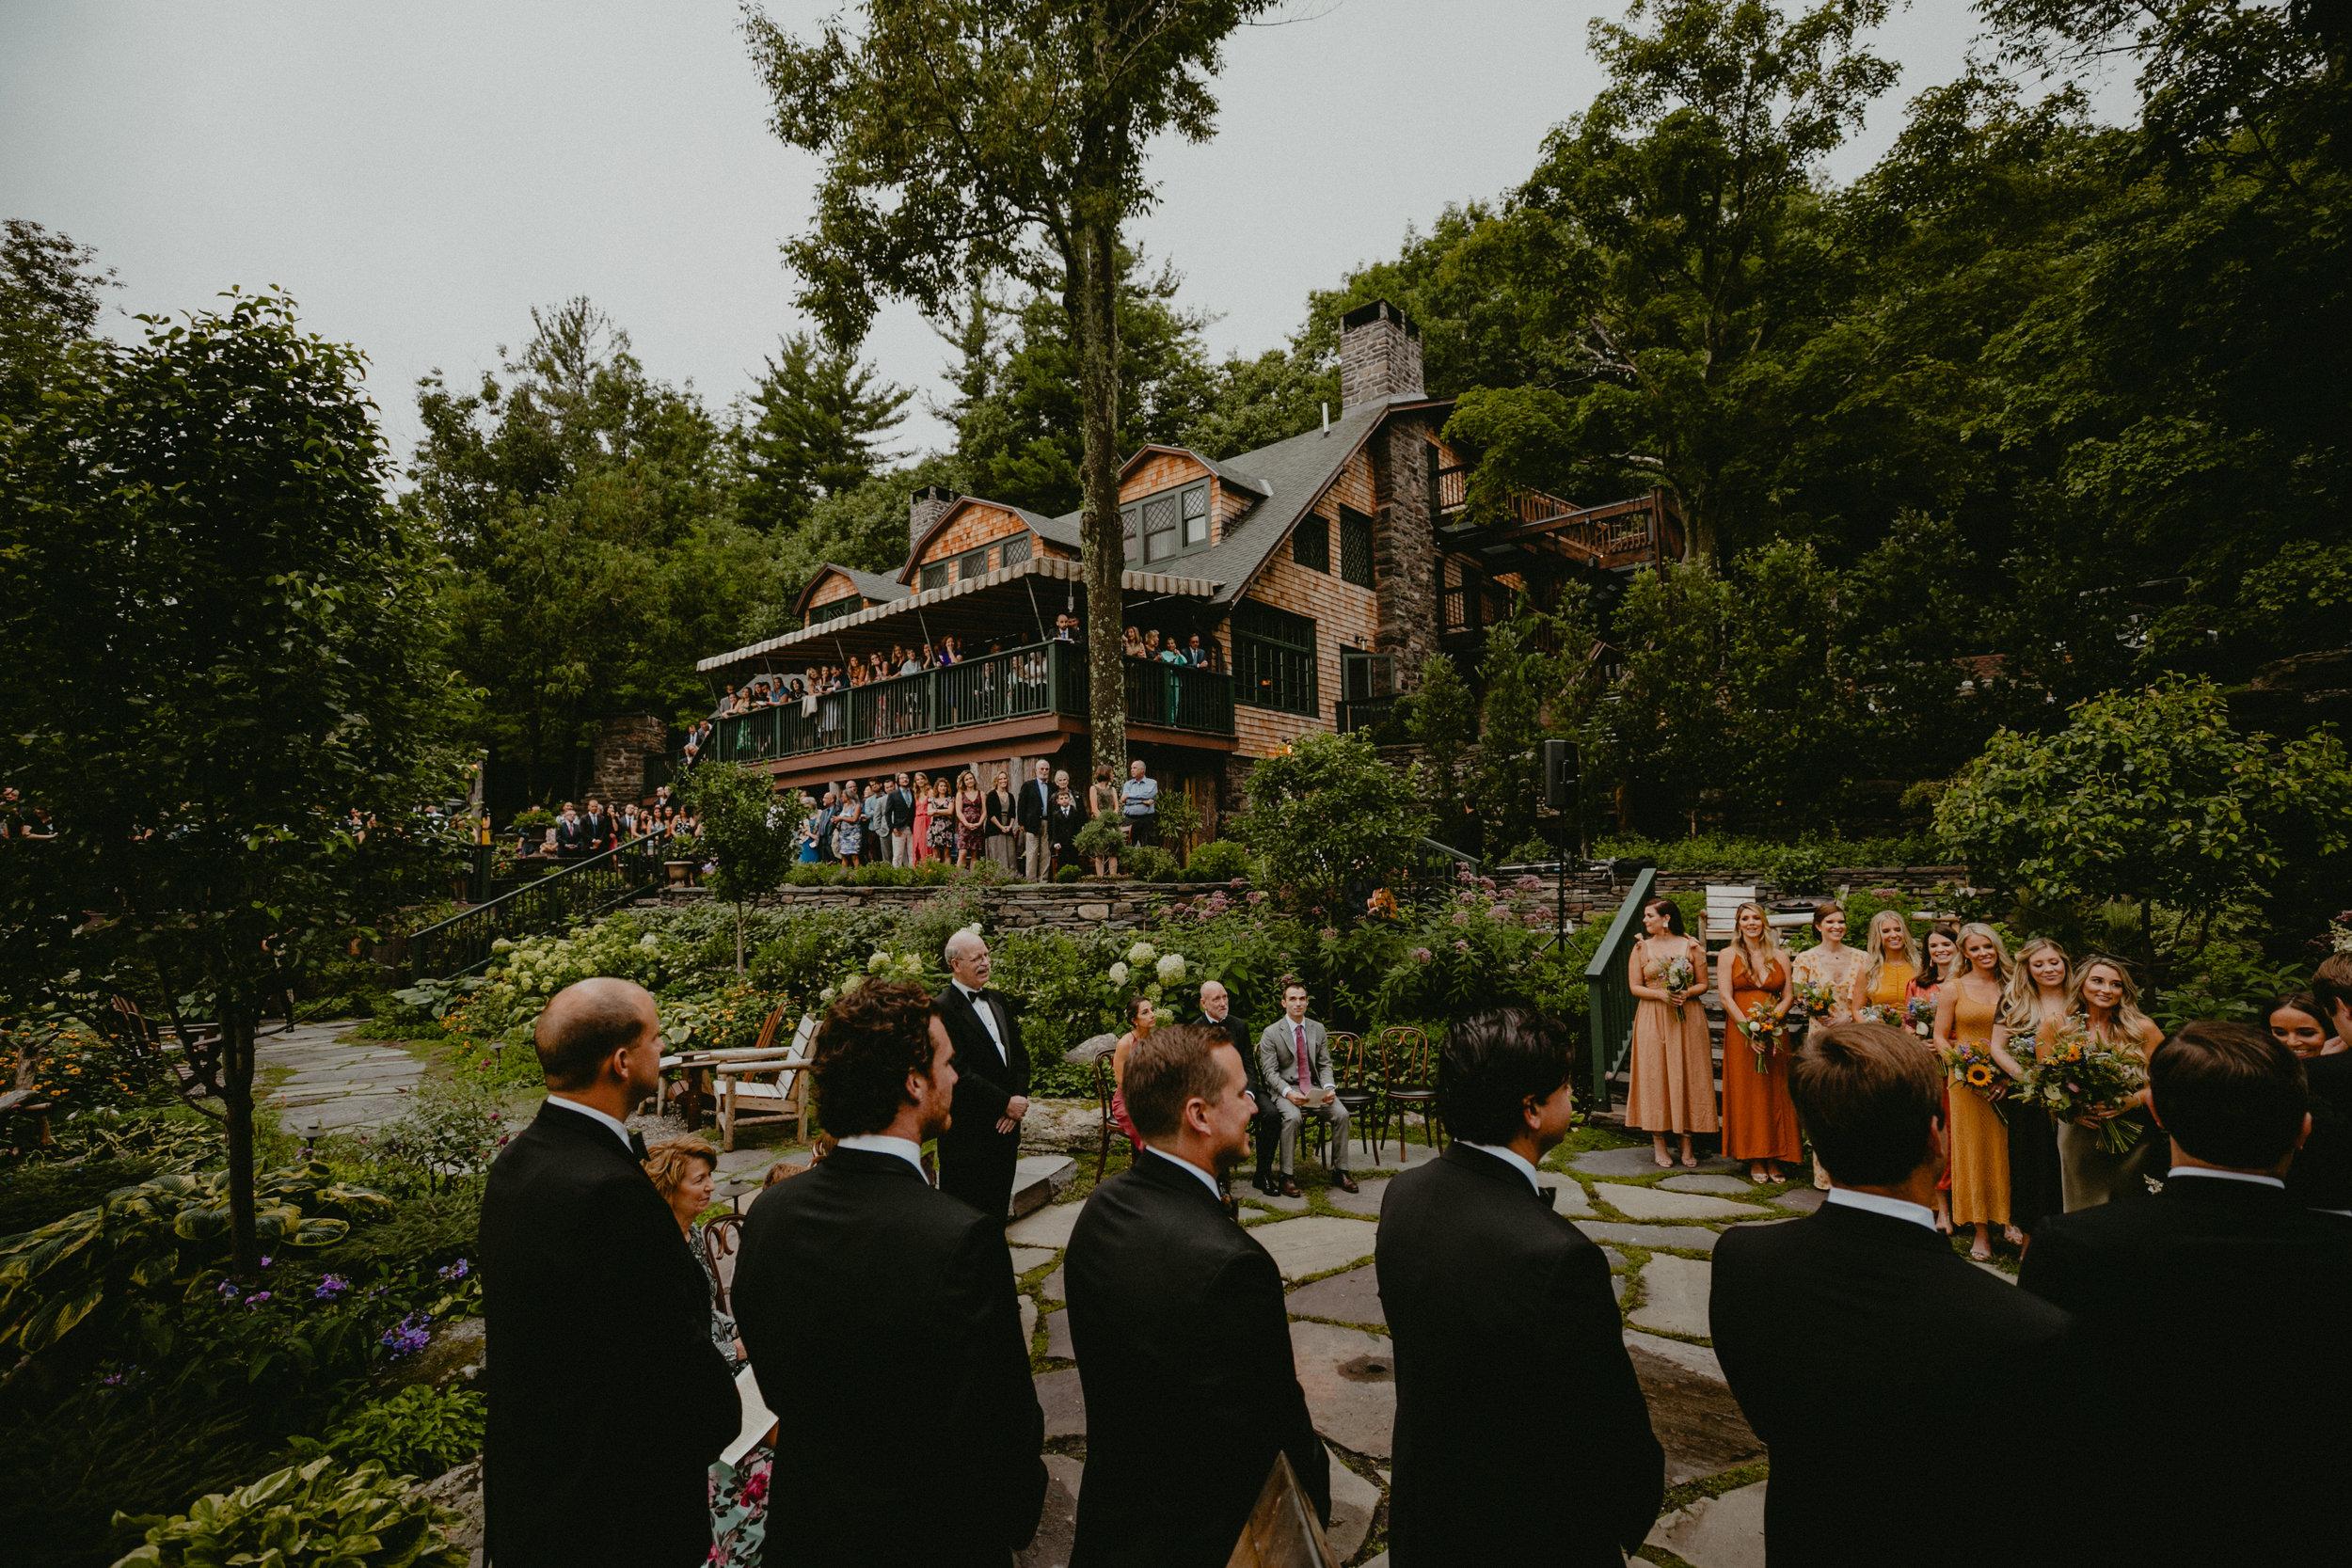 DEER_MOUNTAIN_INN_WEDDING_CHELLISE_MICHAEL_PHOTOGRAPHY-1379.jpg